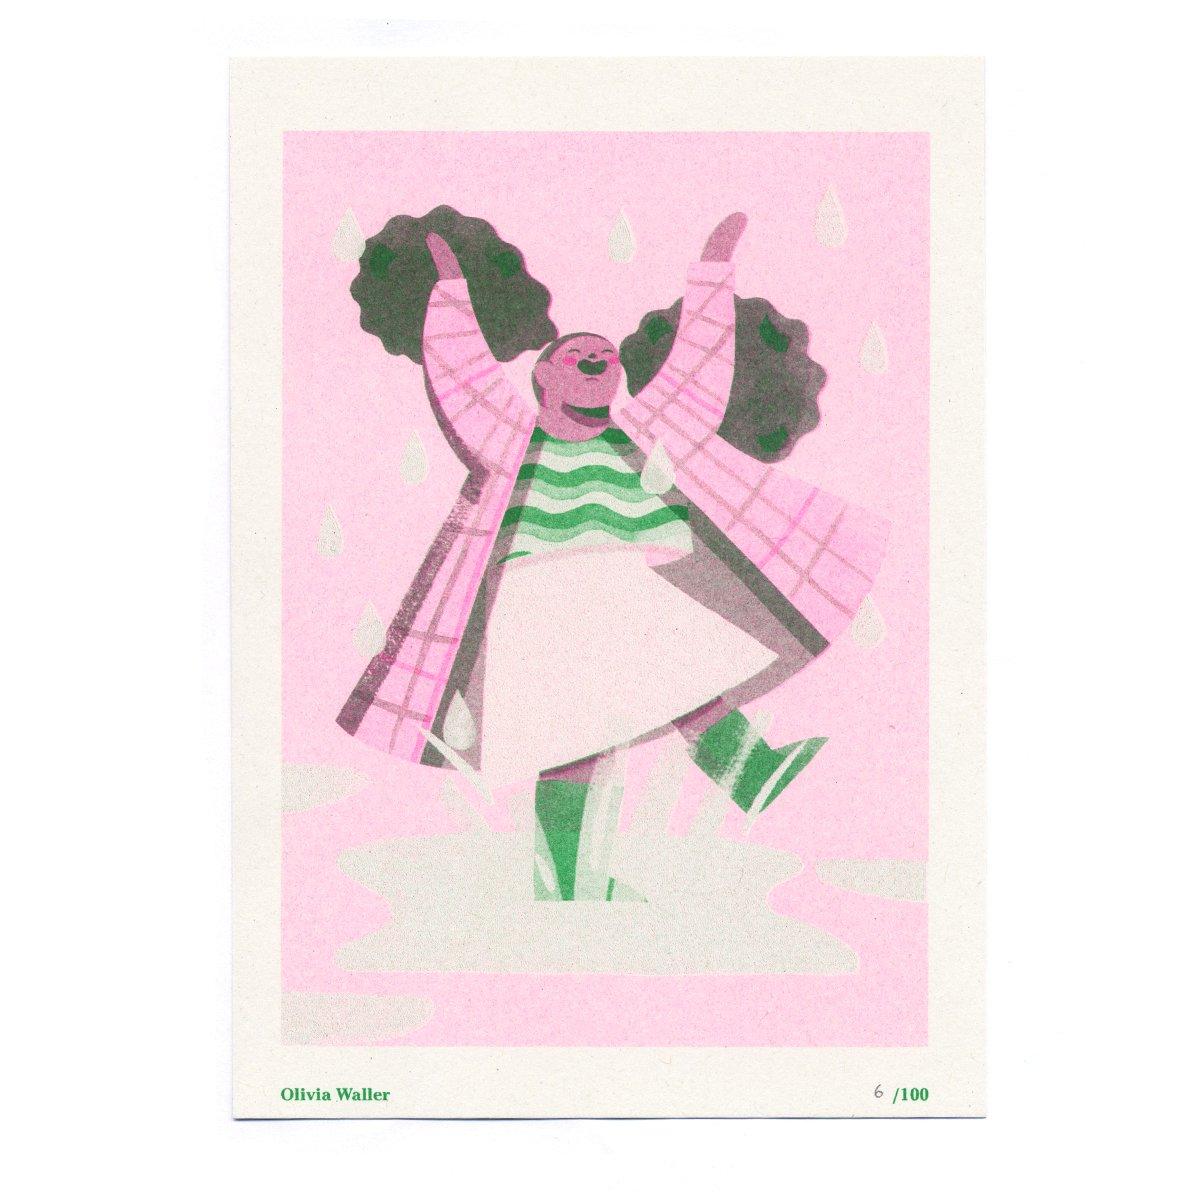 Image of Olivia Waller - Seed Artist Series Riso Print